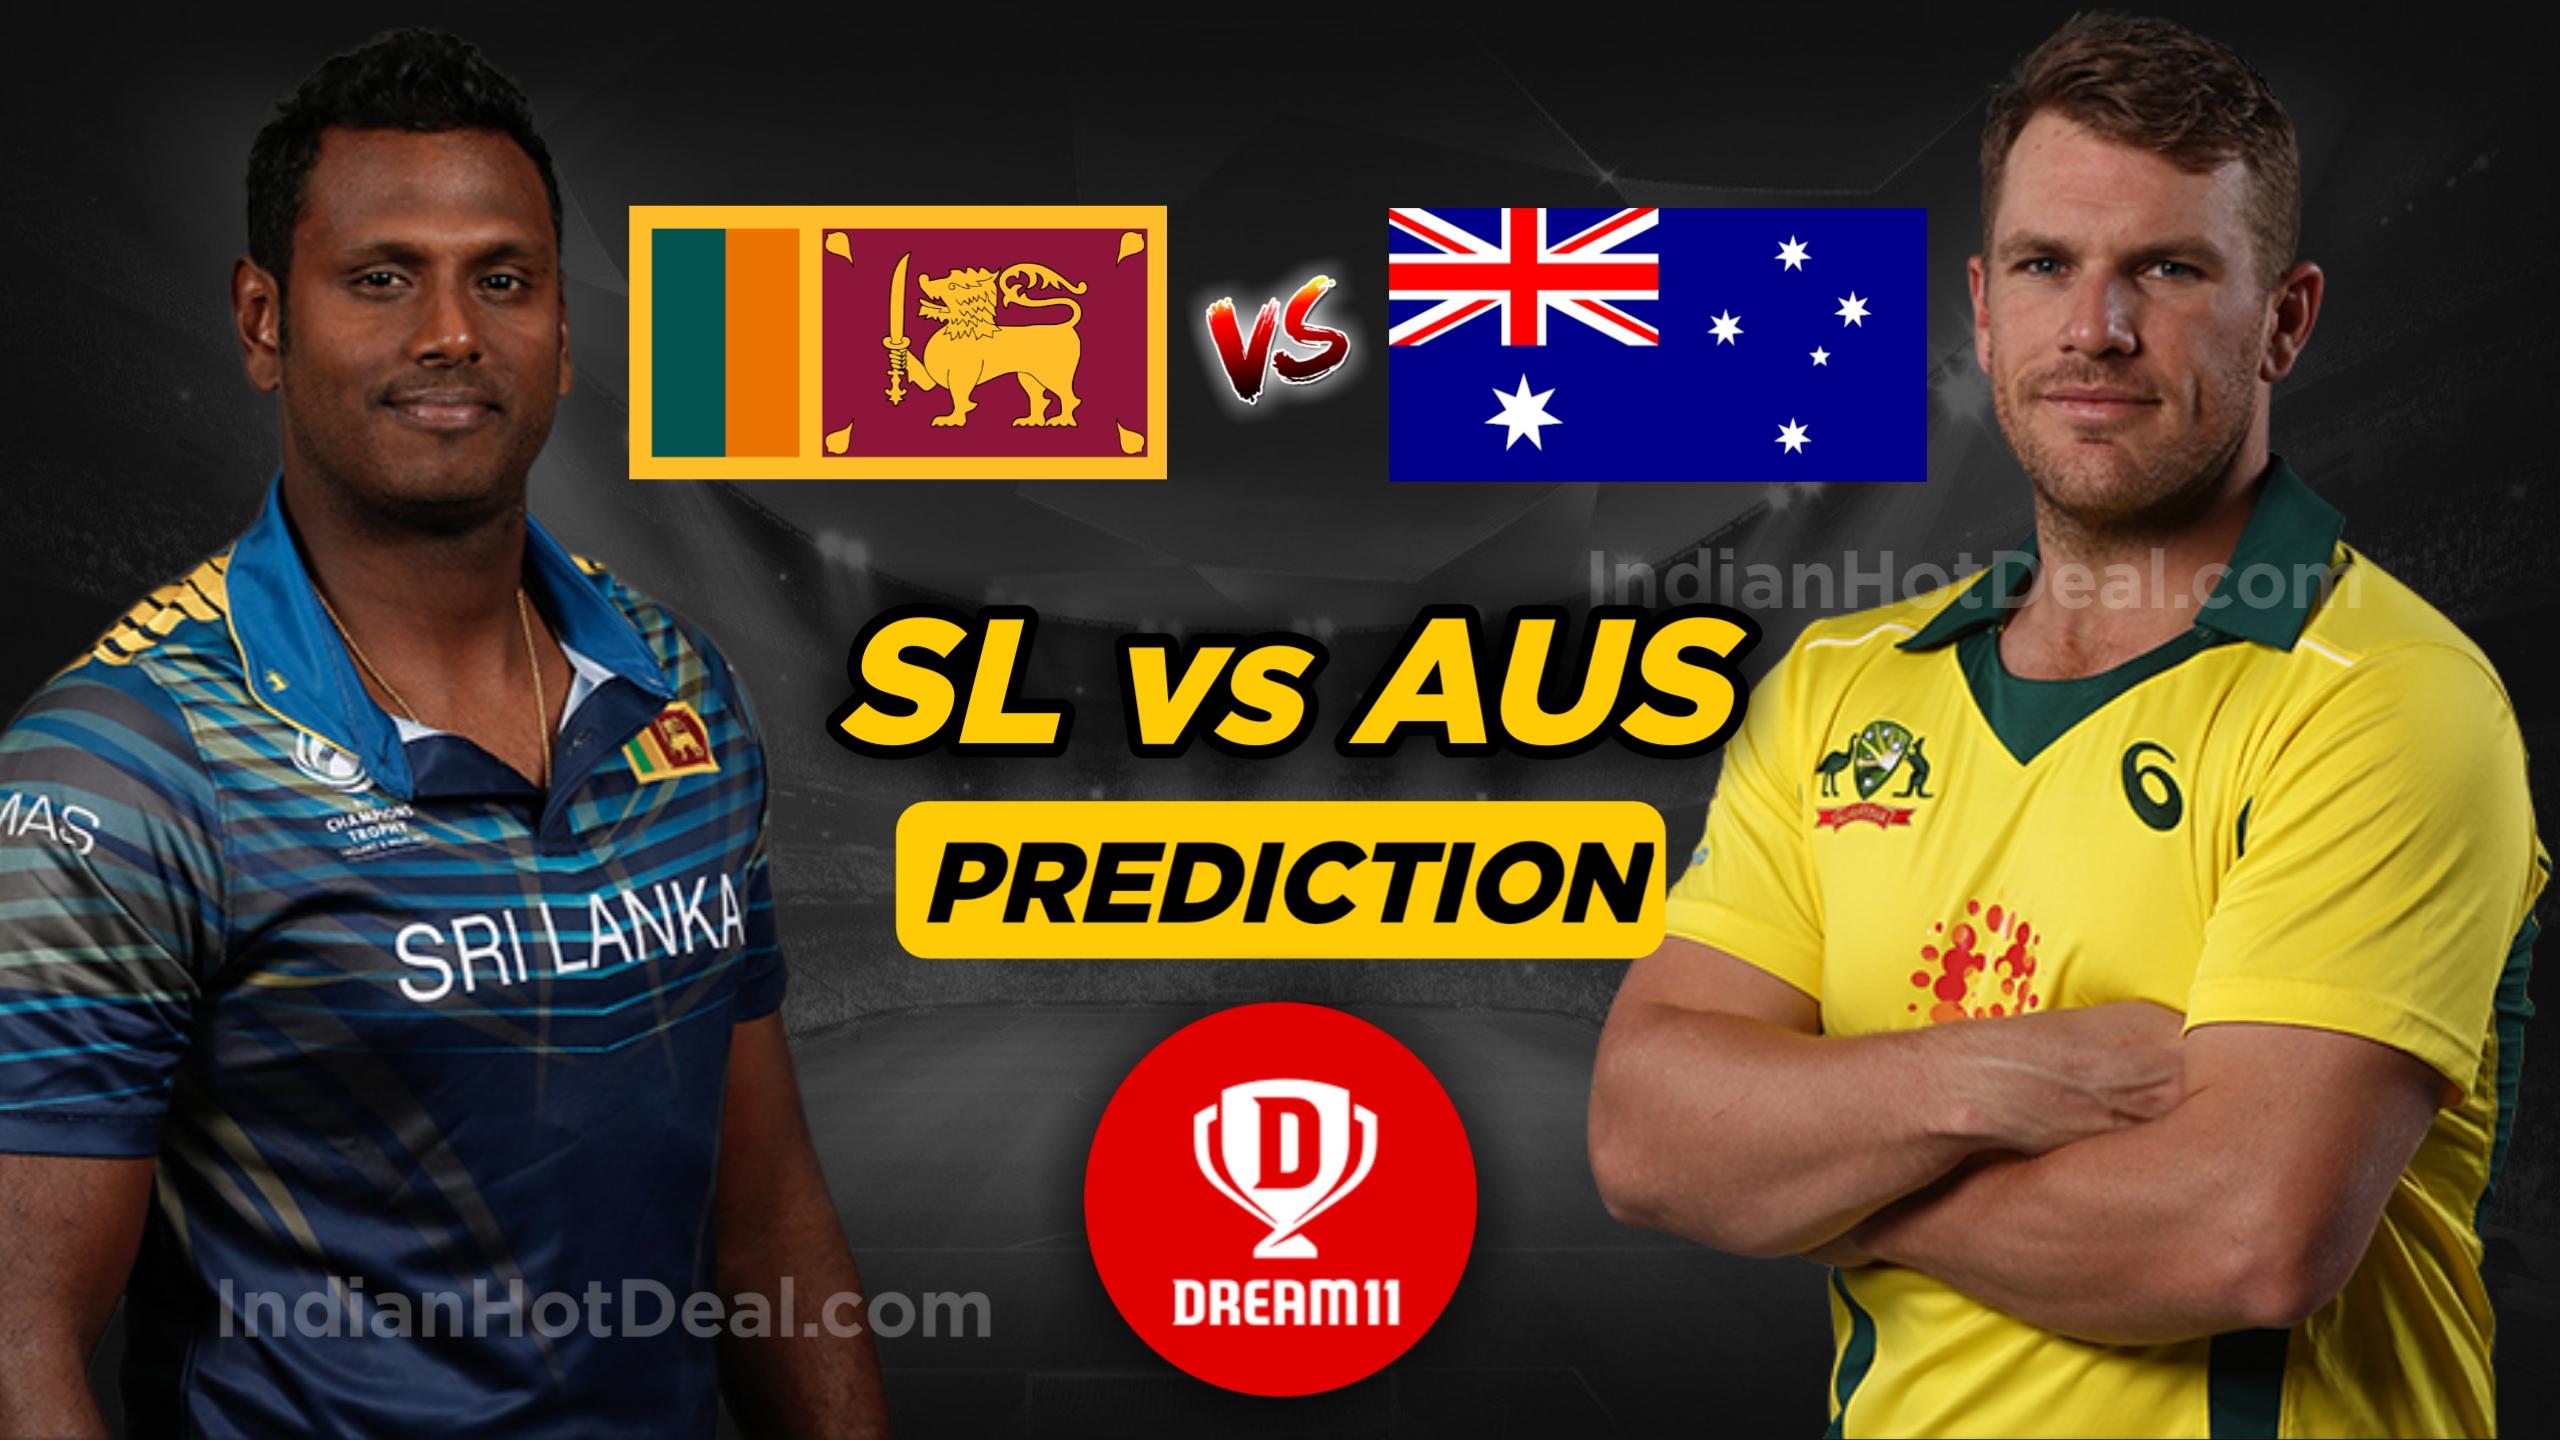 Aus vs SL 2nd T20 dream11 Team